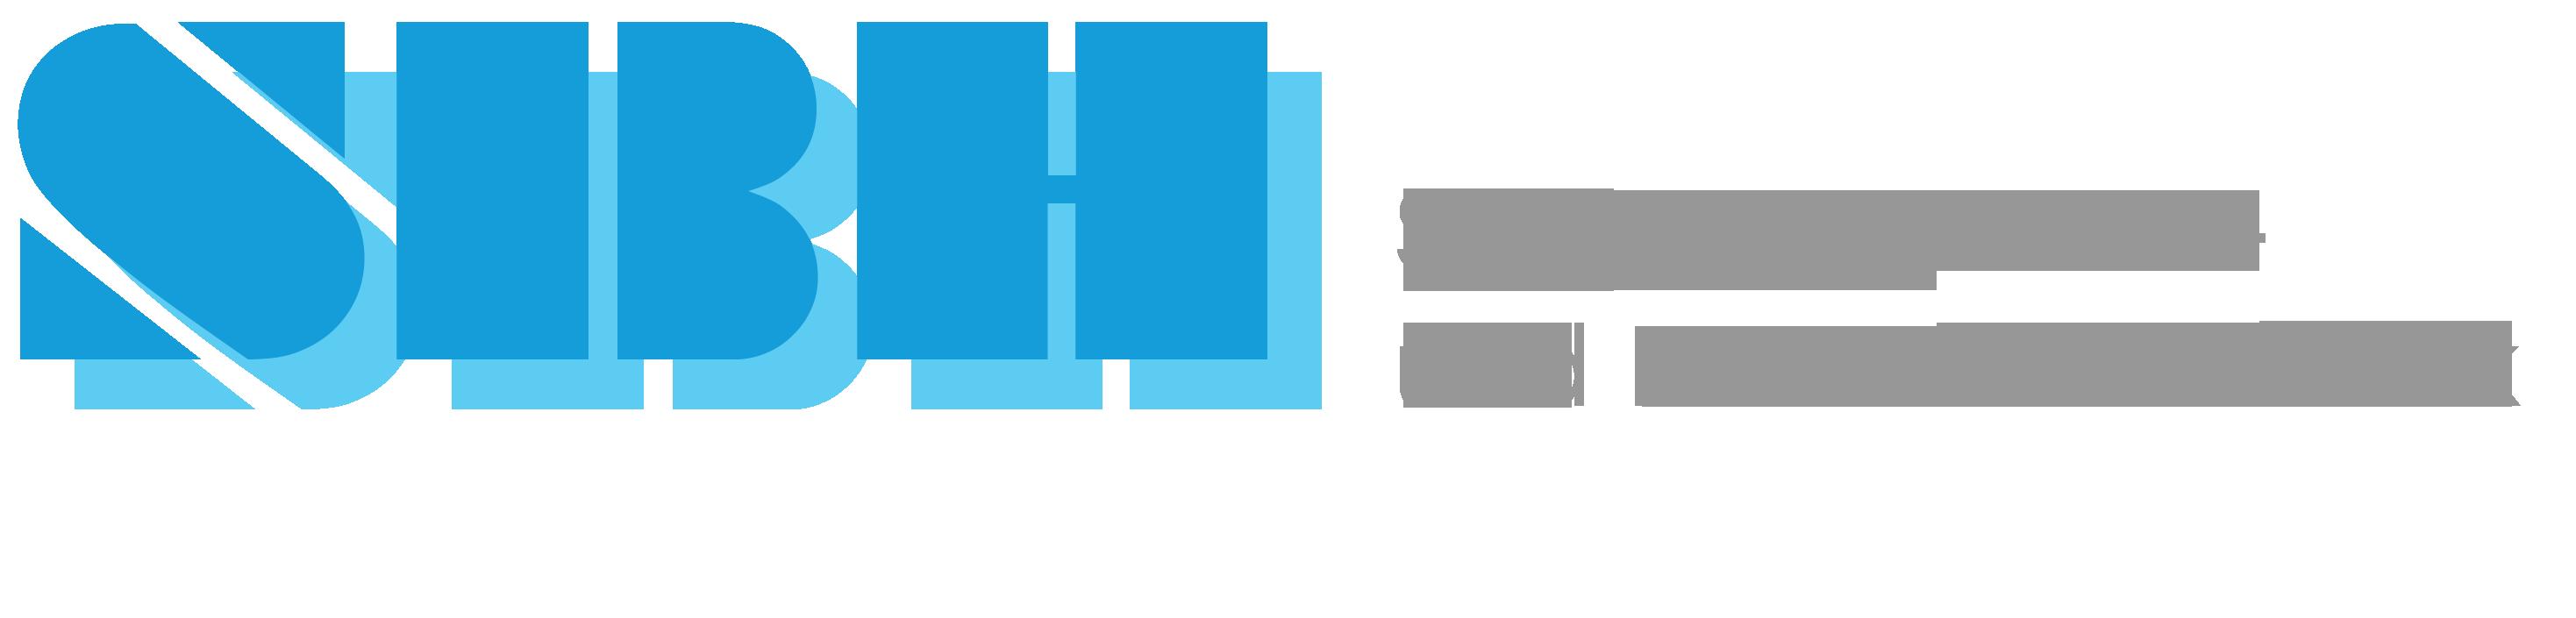 SBH Industriesysteme GmbH Oberhausen